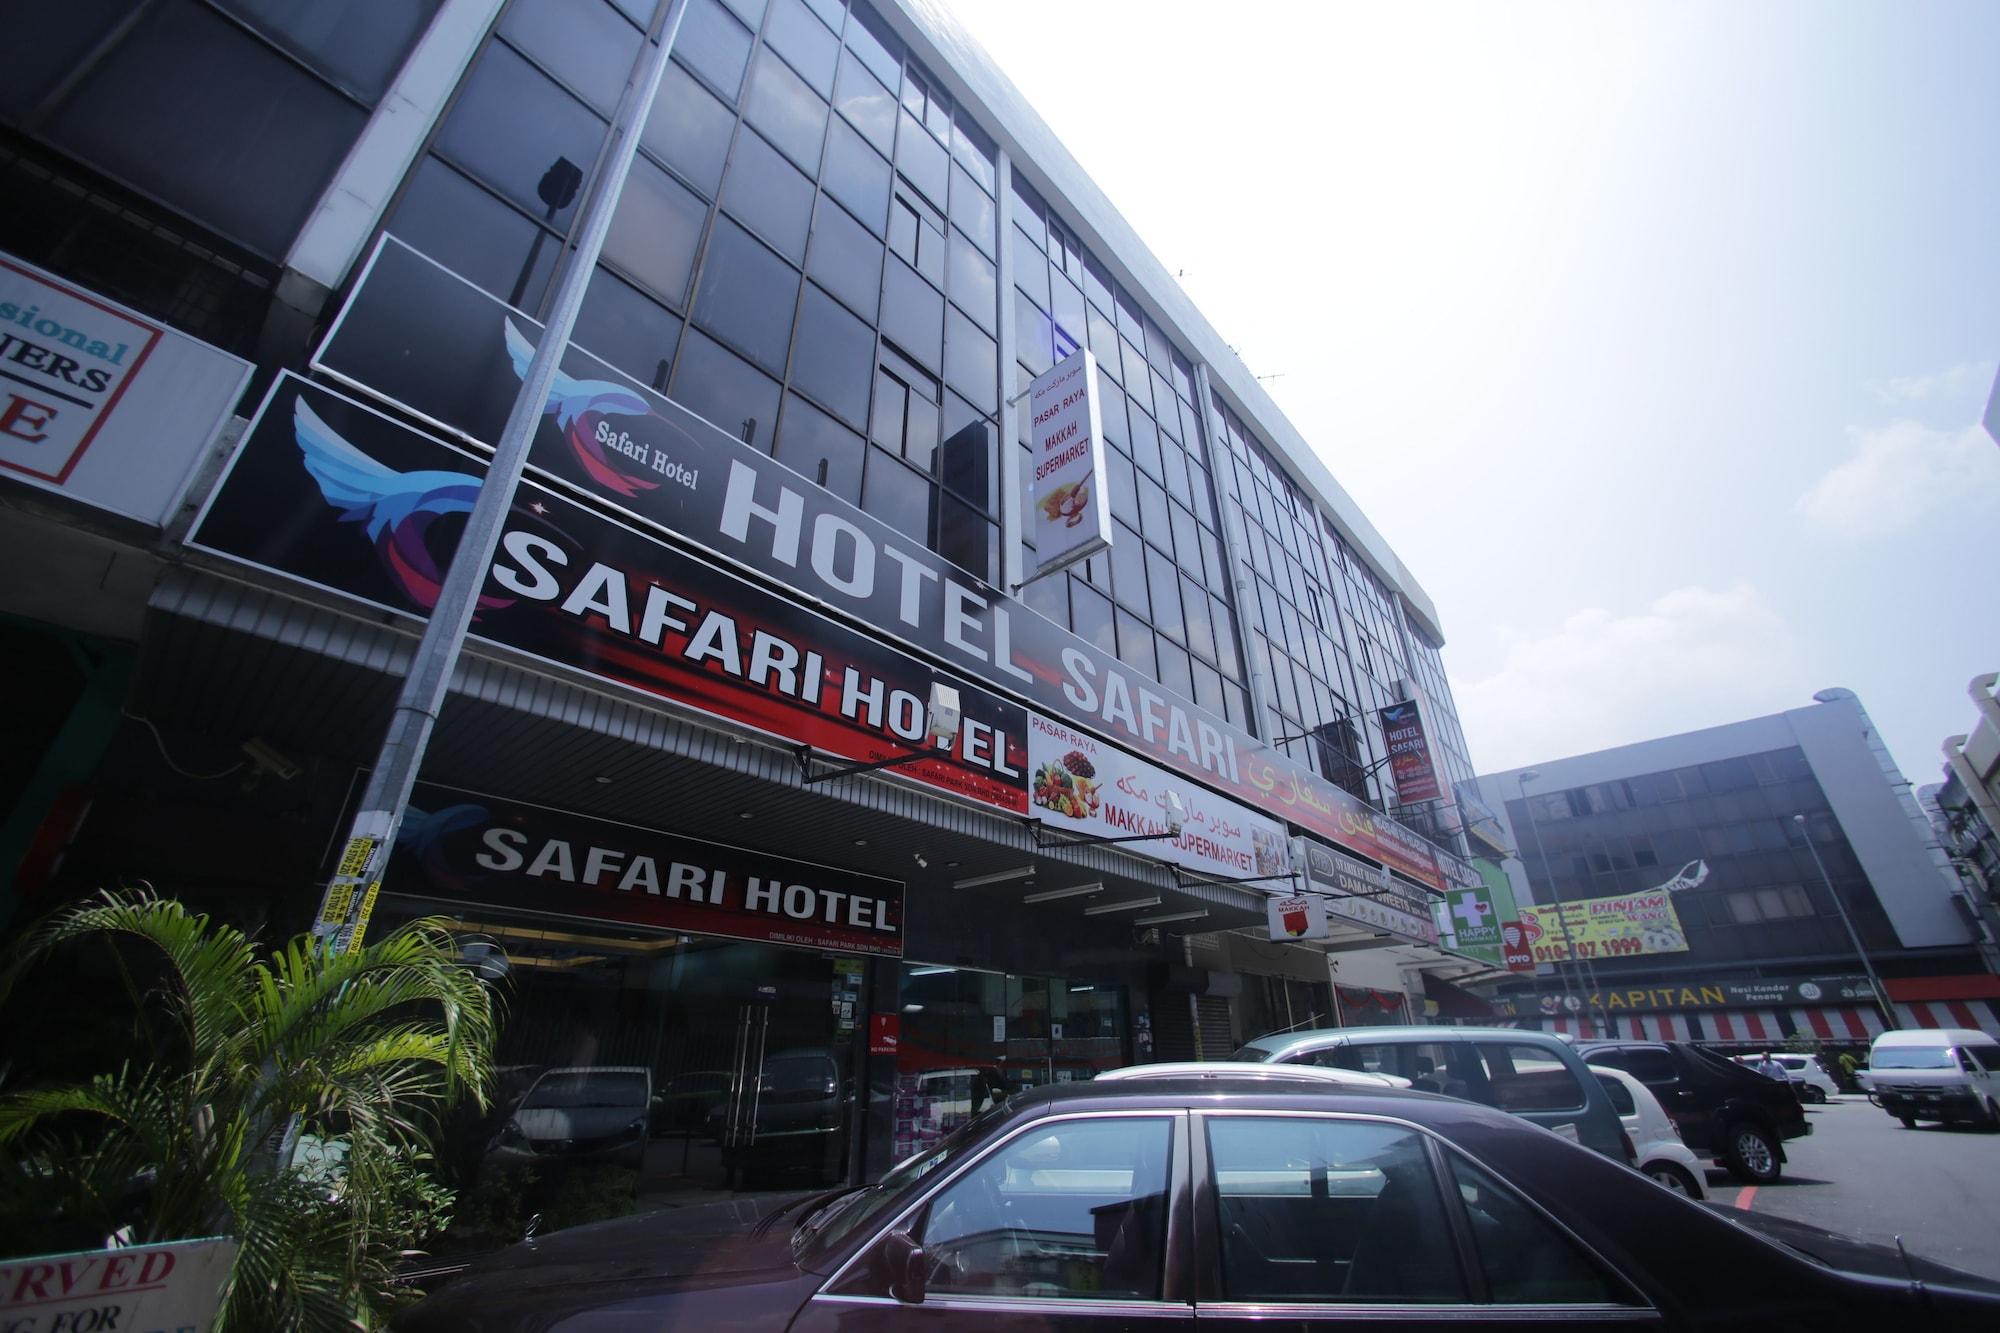 Safari Hotel, Hulu Langat